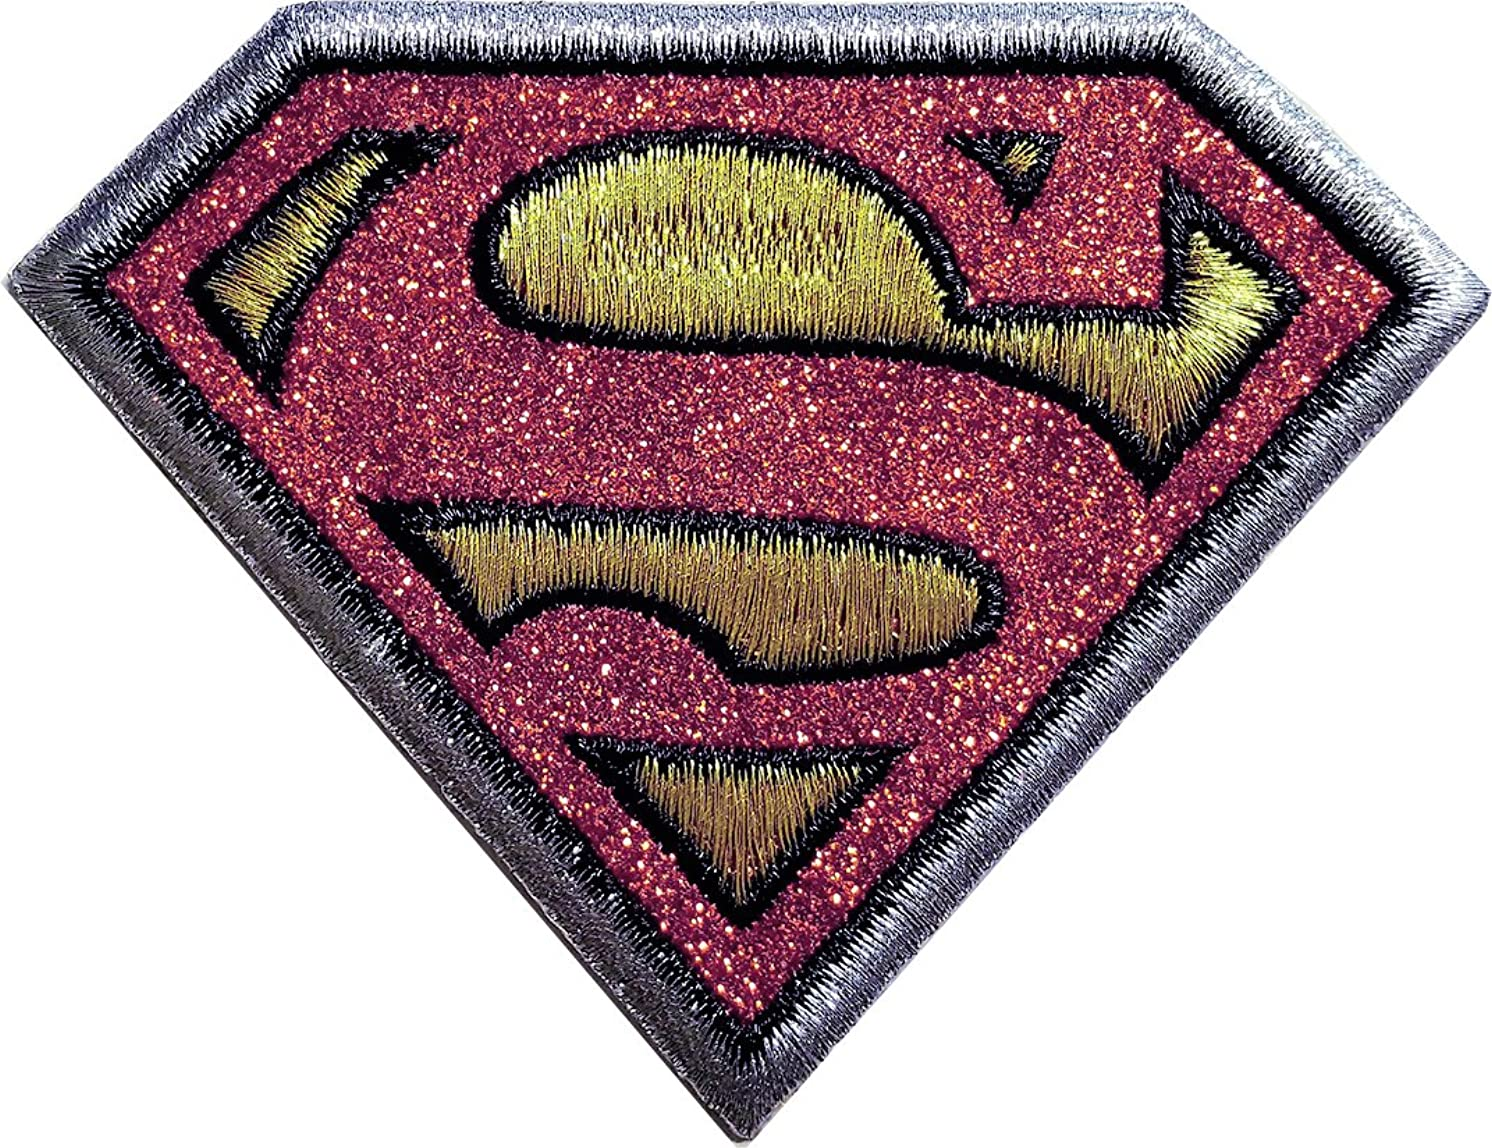 Application DC Comics Originals Superman Logo with Gold Glitter Patch, 2